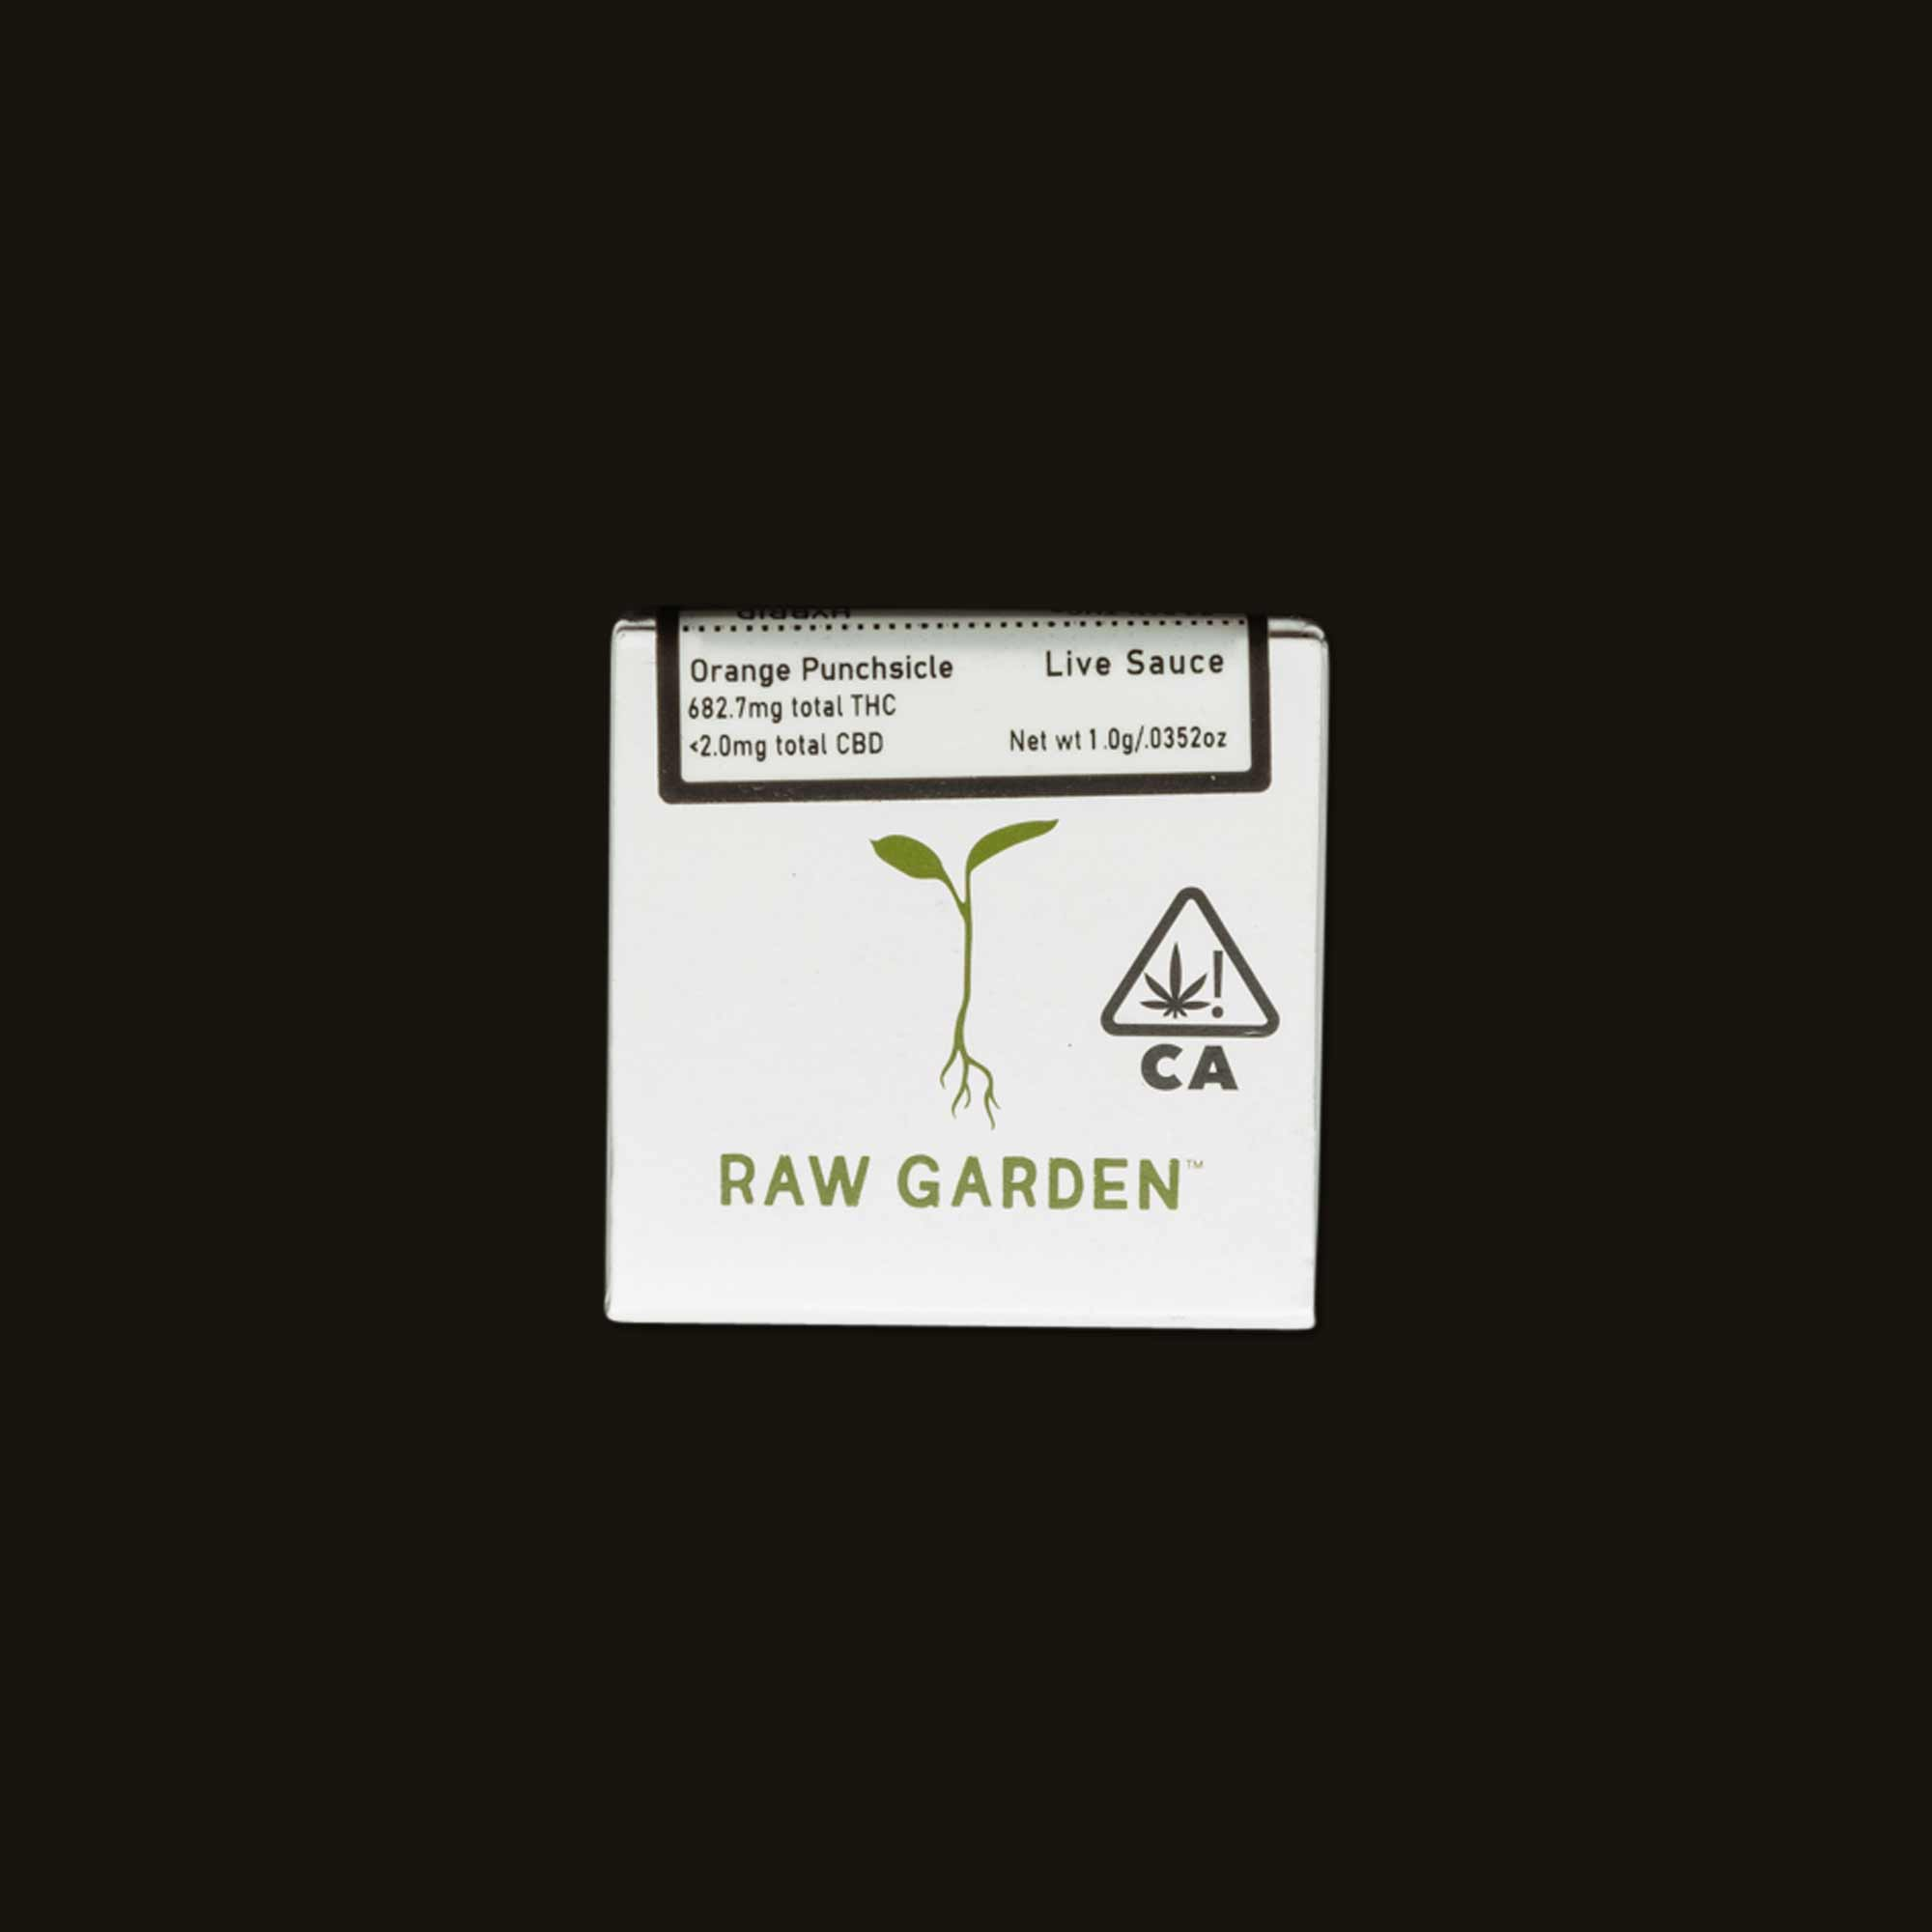 Raw Gardens Orange Punchsicle Sauce